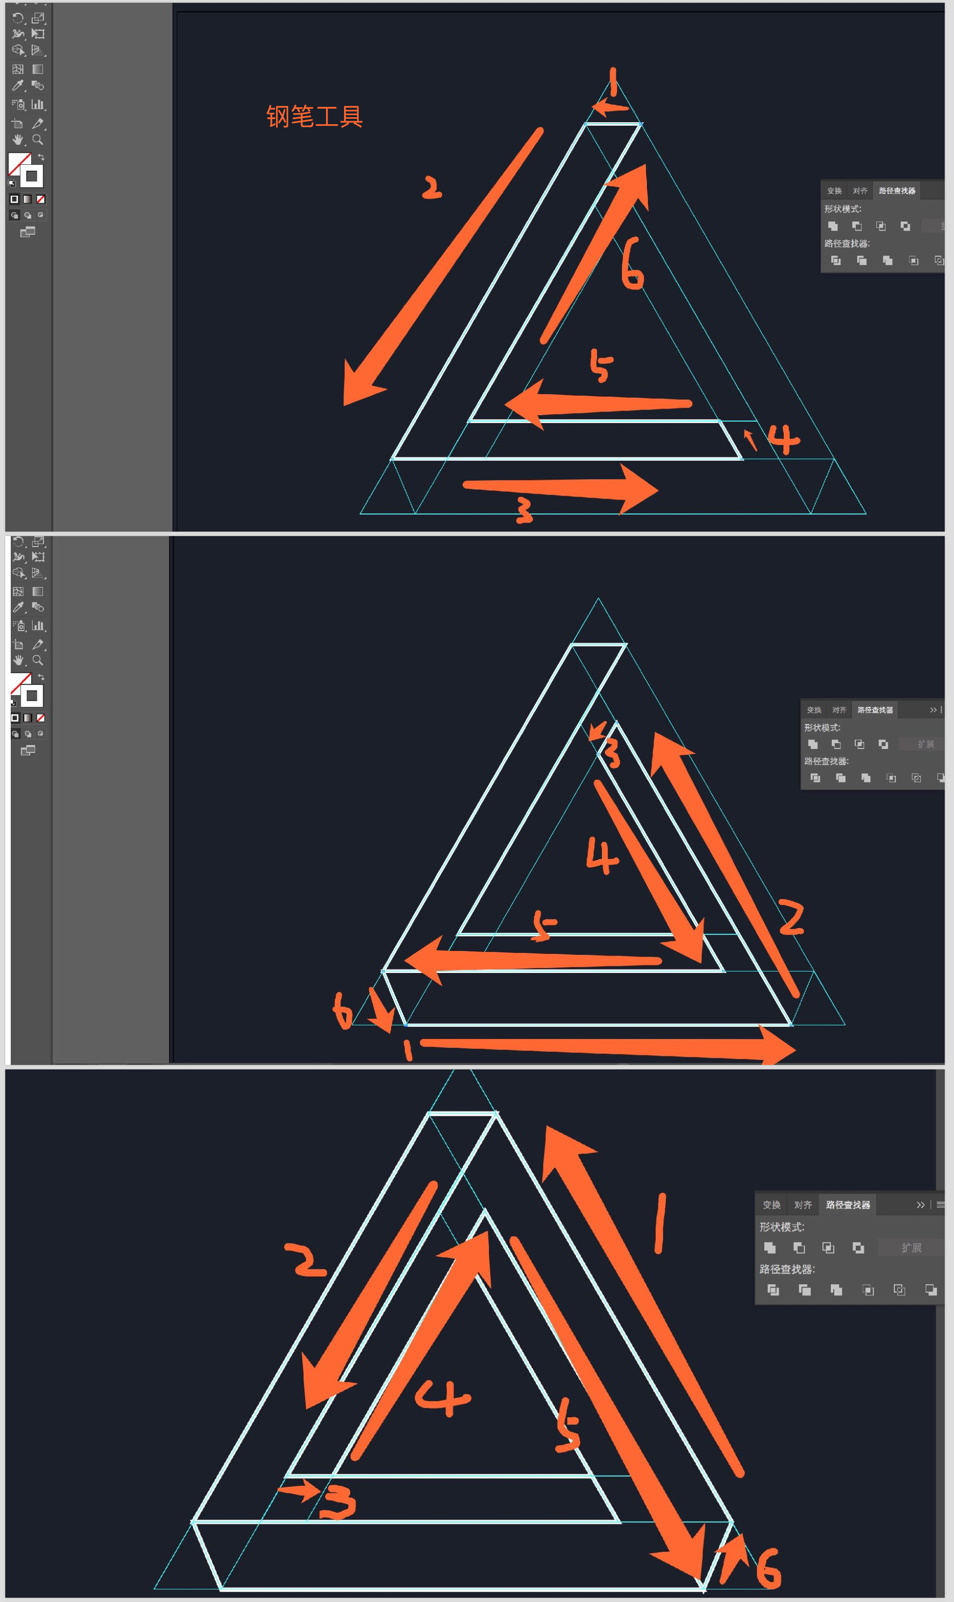 AI教程!教你 6 分钟快速上手潘洛斯三角